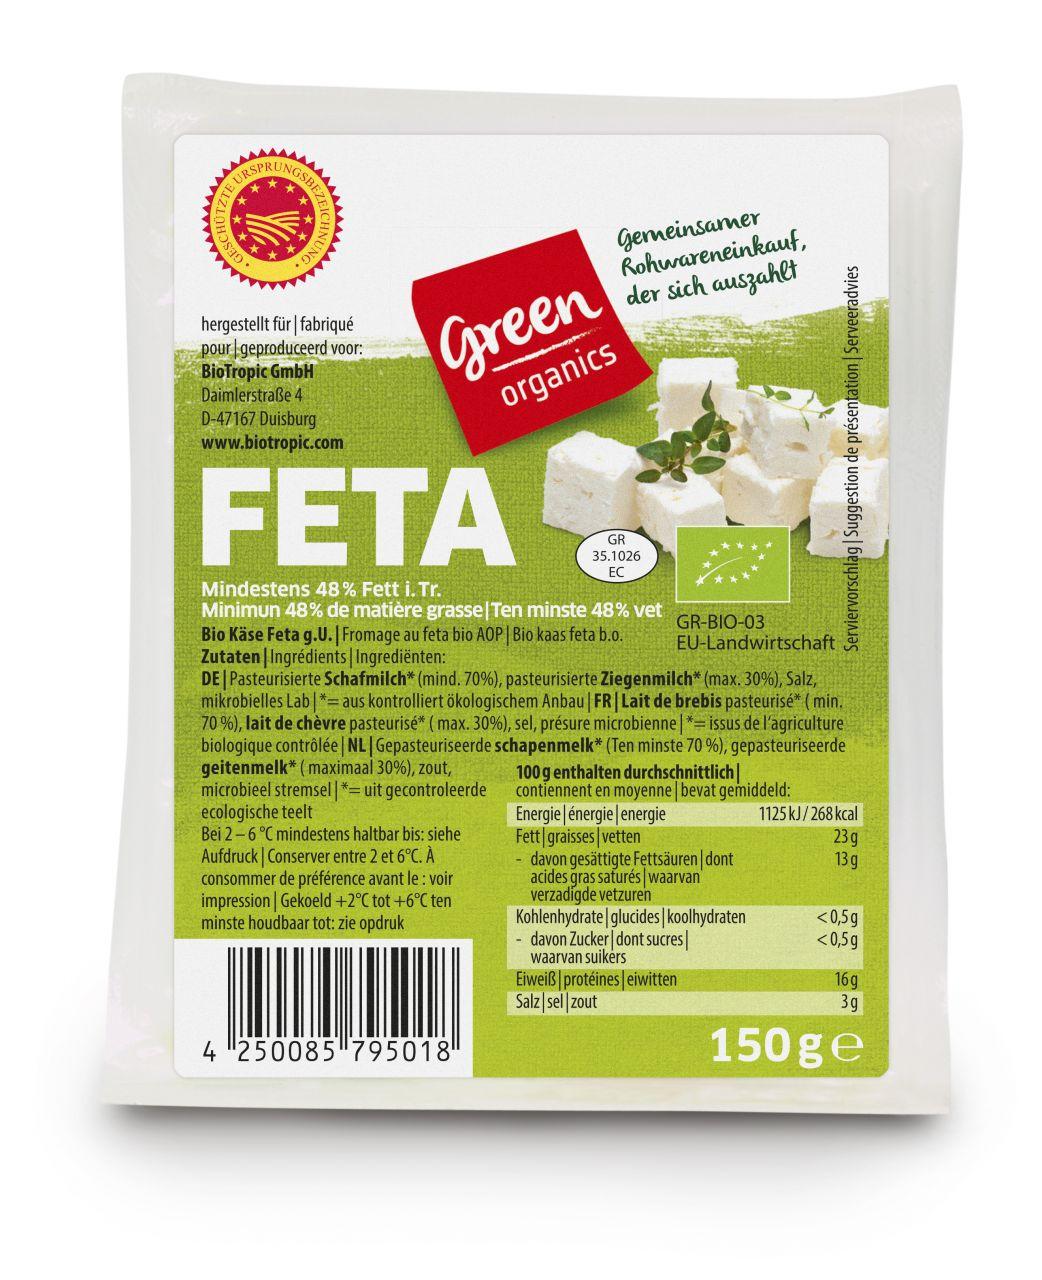 griechischer Feta